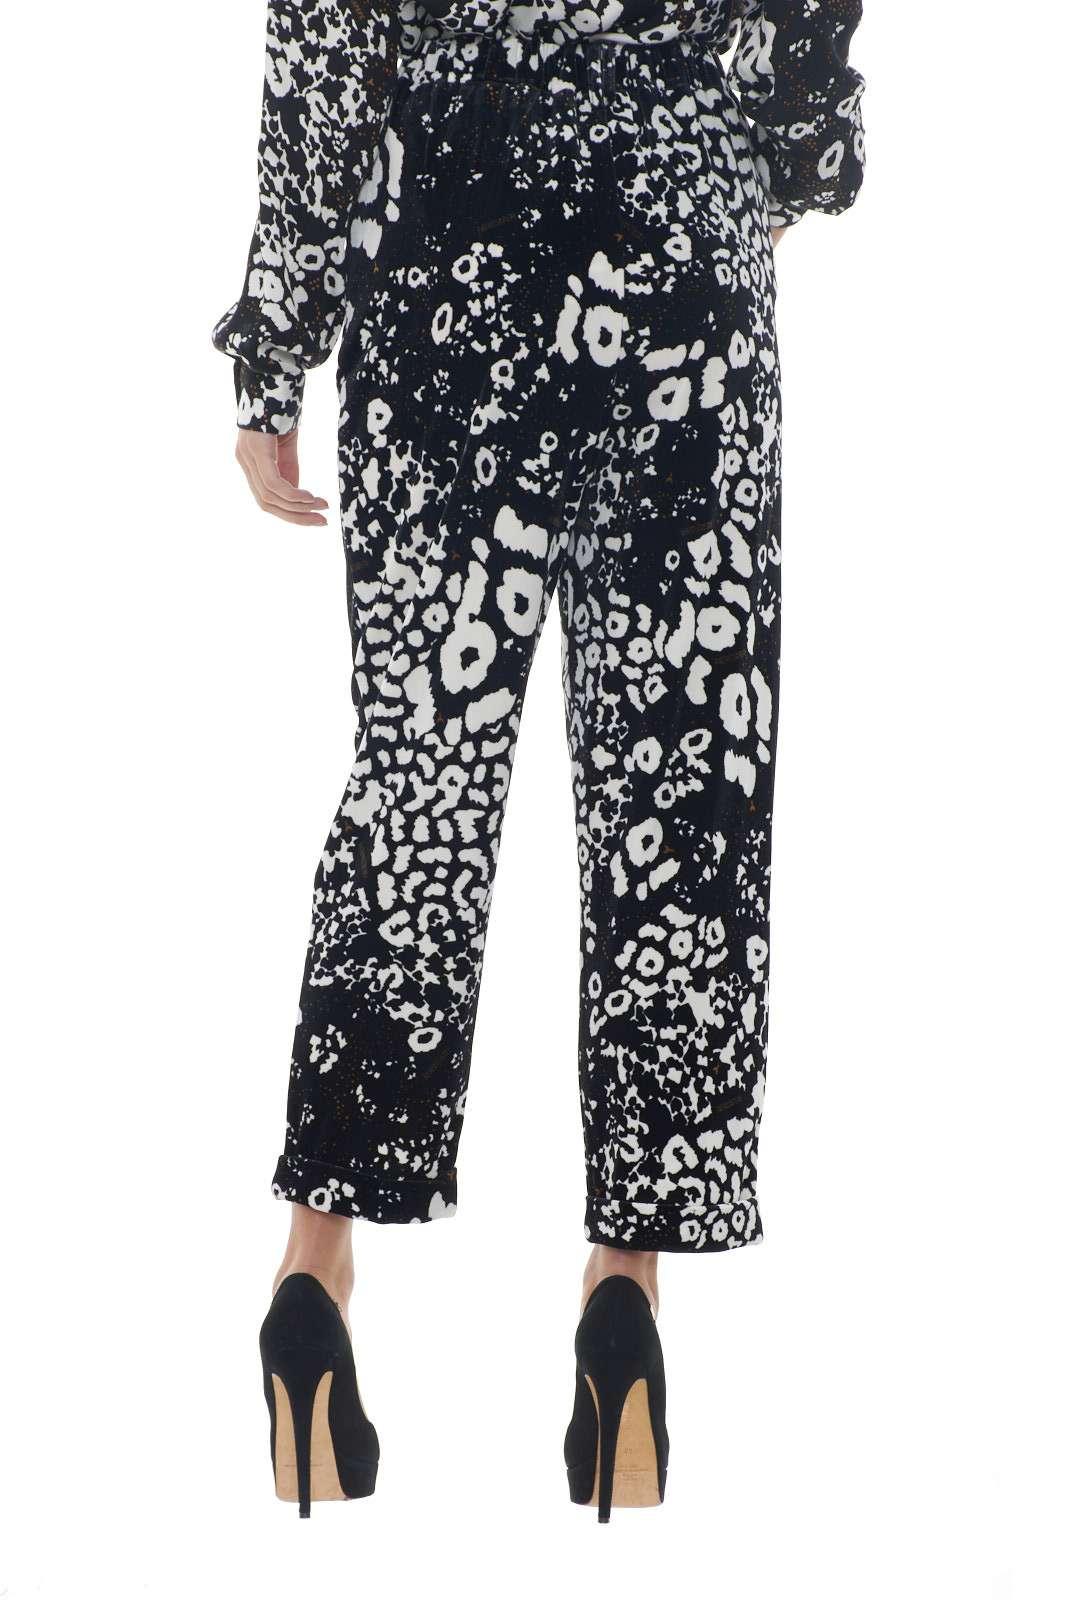 https://www.parmax.com/media/catalog/product/a/i/AI-outlet_parmax-pantaloni-donna-Patrizia-Pepe-2p1179-C.jpg